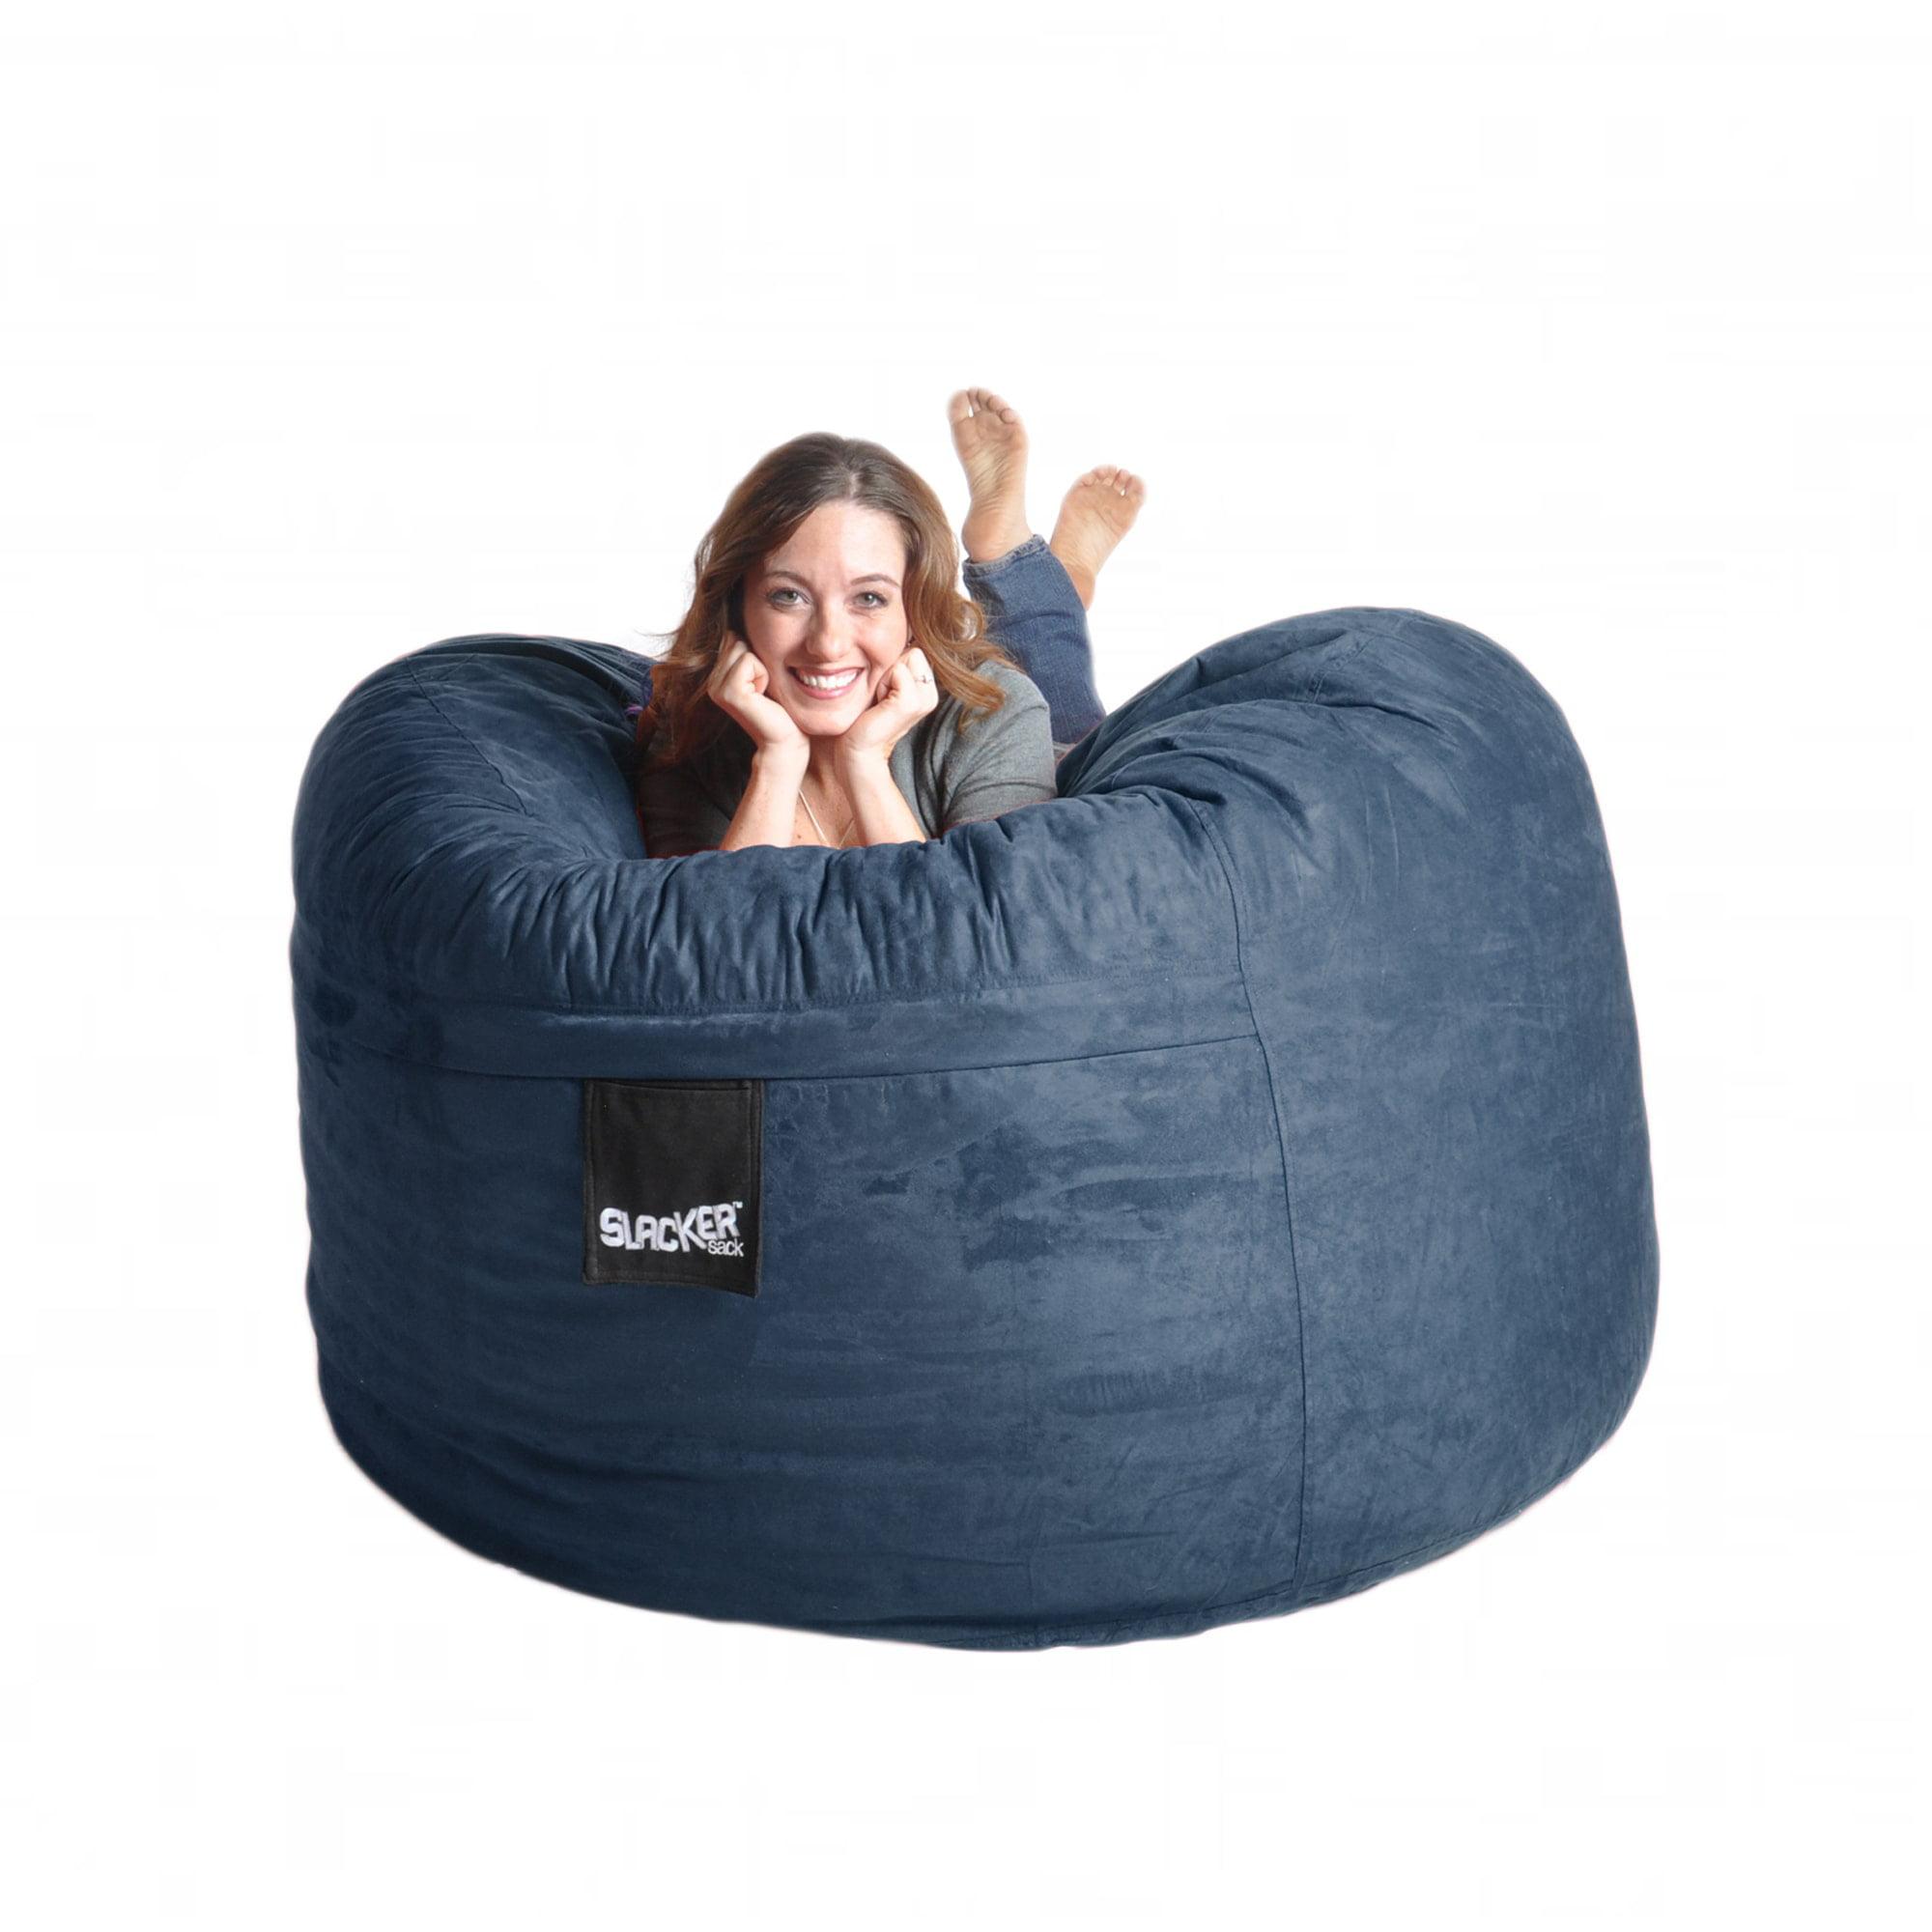 Slacker Sack Navy Blue Microfiber and Memory Foam 5-foot Bean Bag